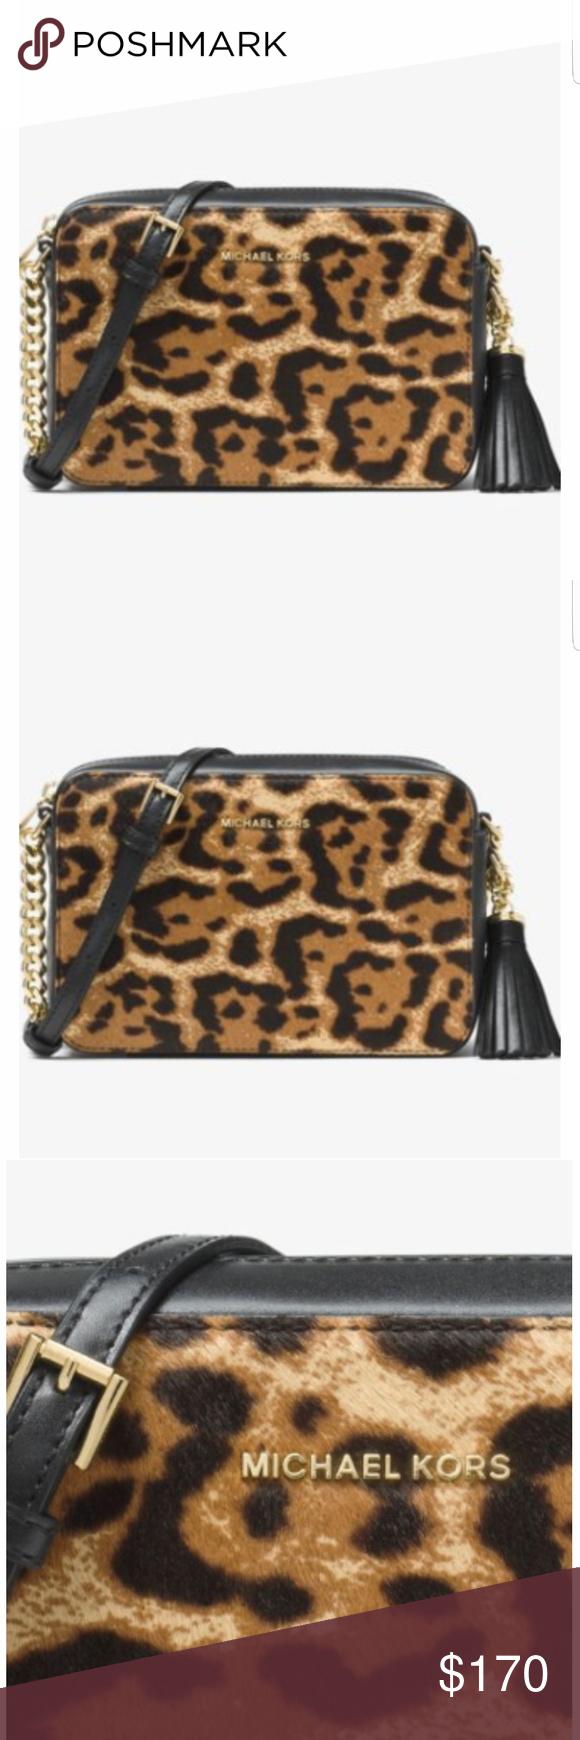 6d4a8f0cc98a ️MICHAEL KORS crossbody Name  ▫️Ginny Leopard Calf Hair Crossbody ▫️Style